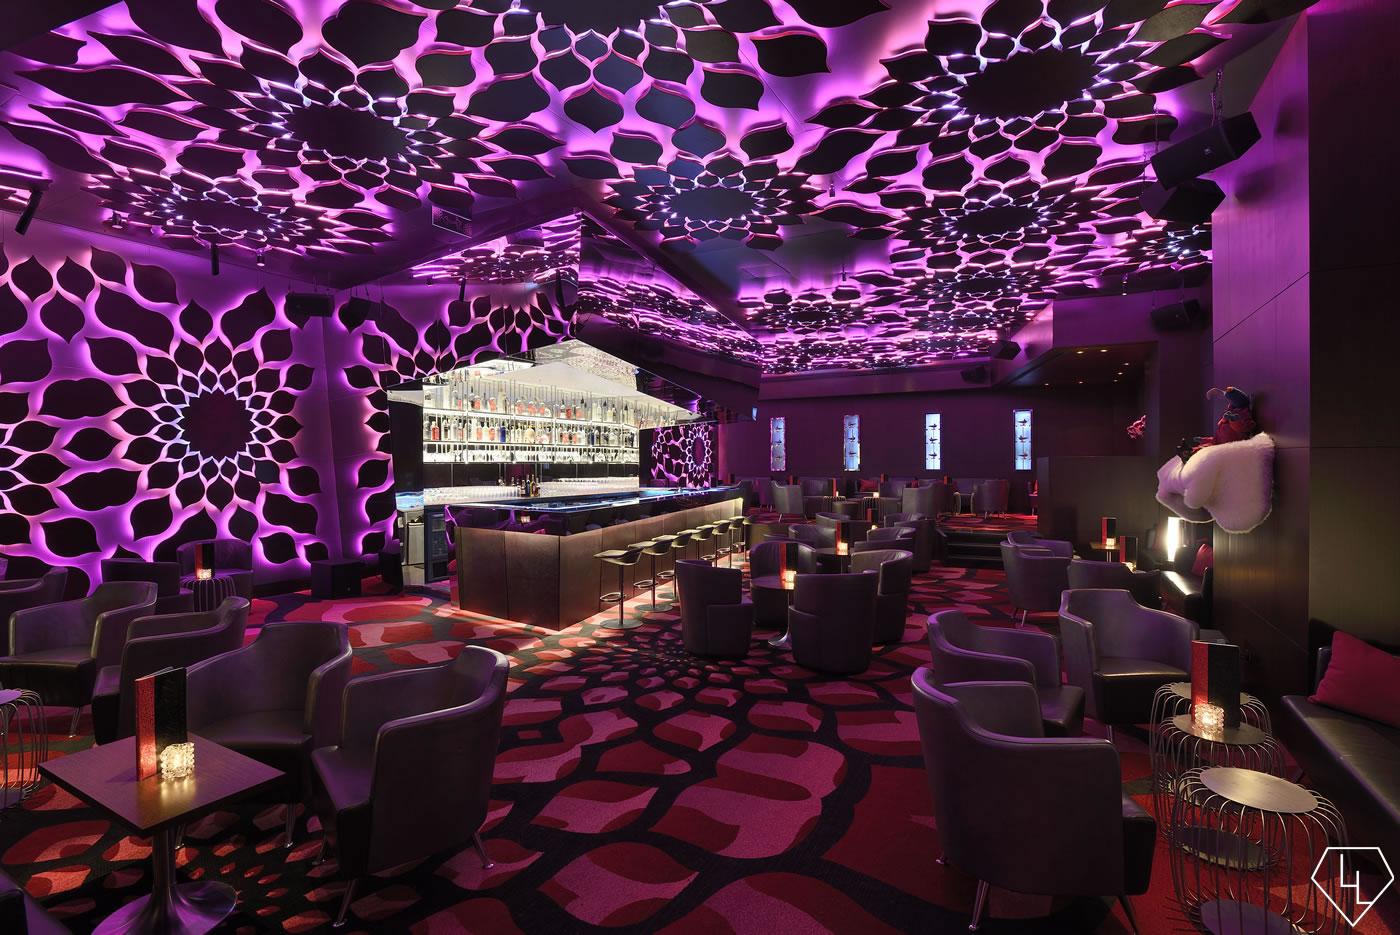 Design Notes U2013 A Look Inside The Trippy Razzmatazz Bar At The JW Marriott  Absheron Baku, Azerbaijan